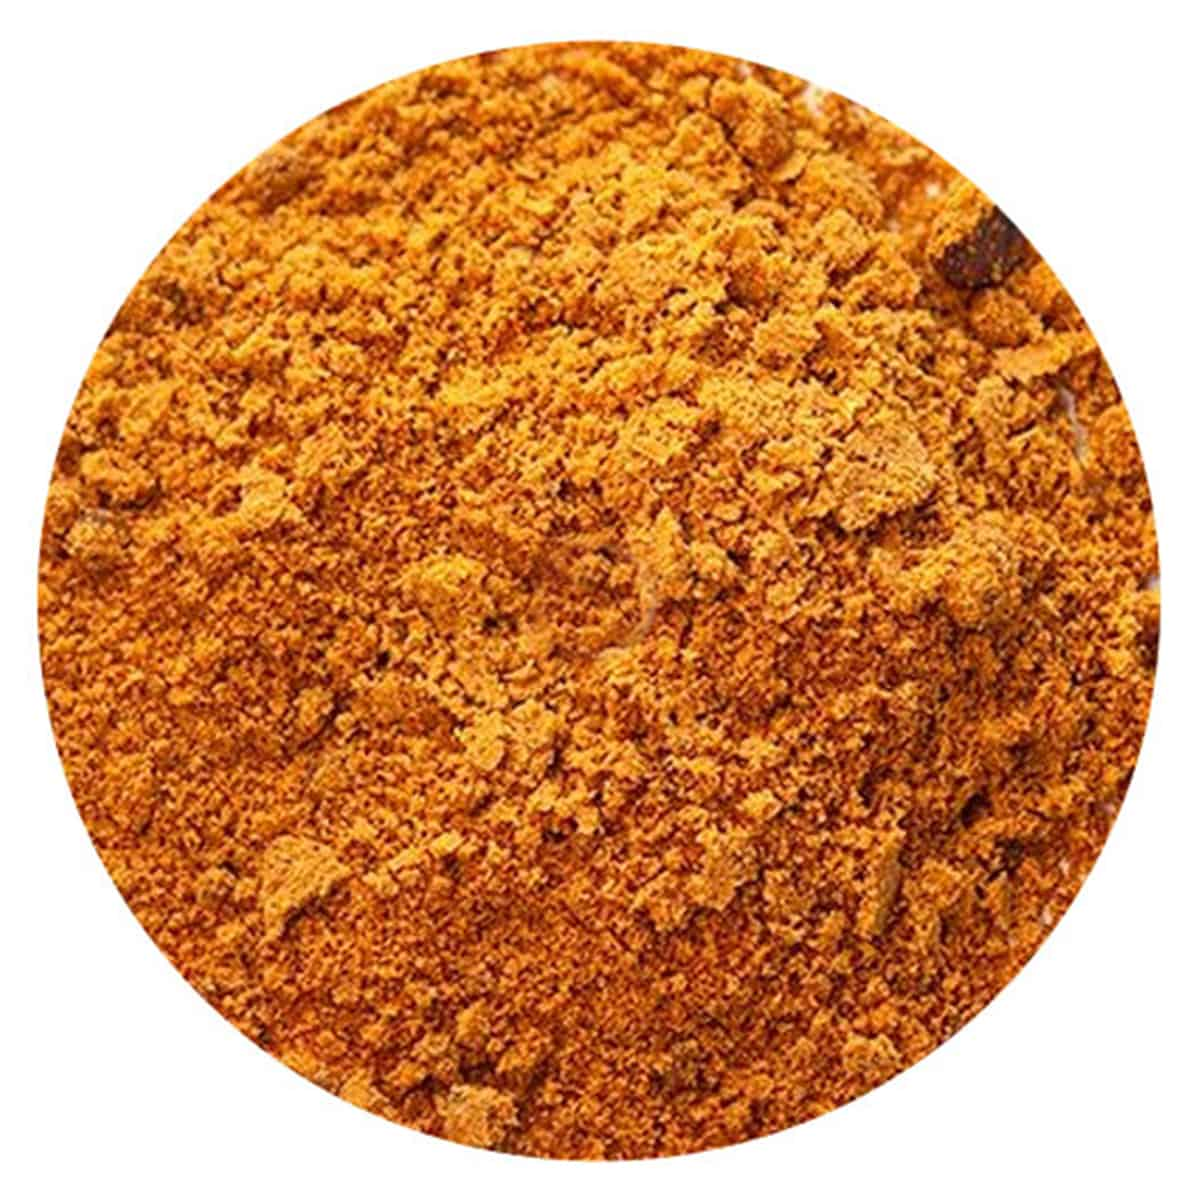 Buy IAG Foods Mace Powder - 1 kg